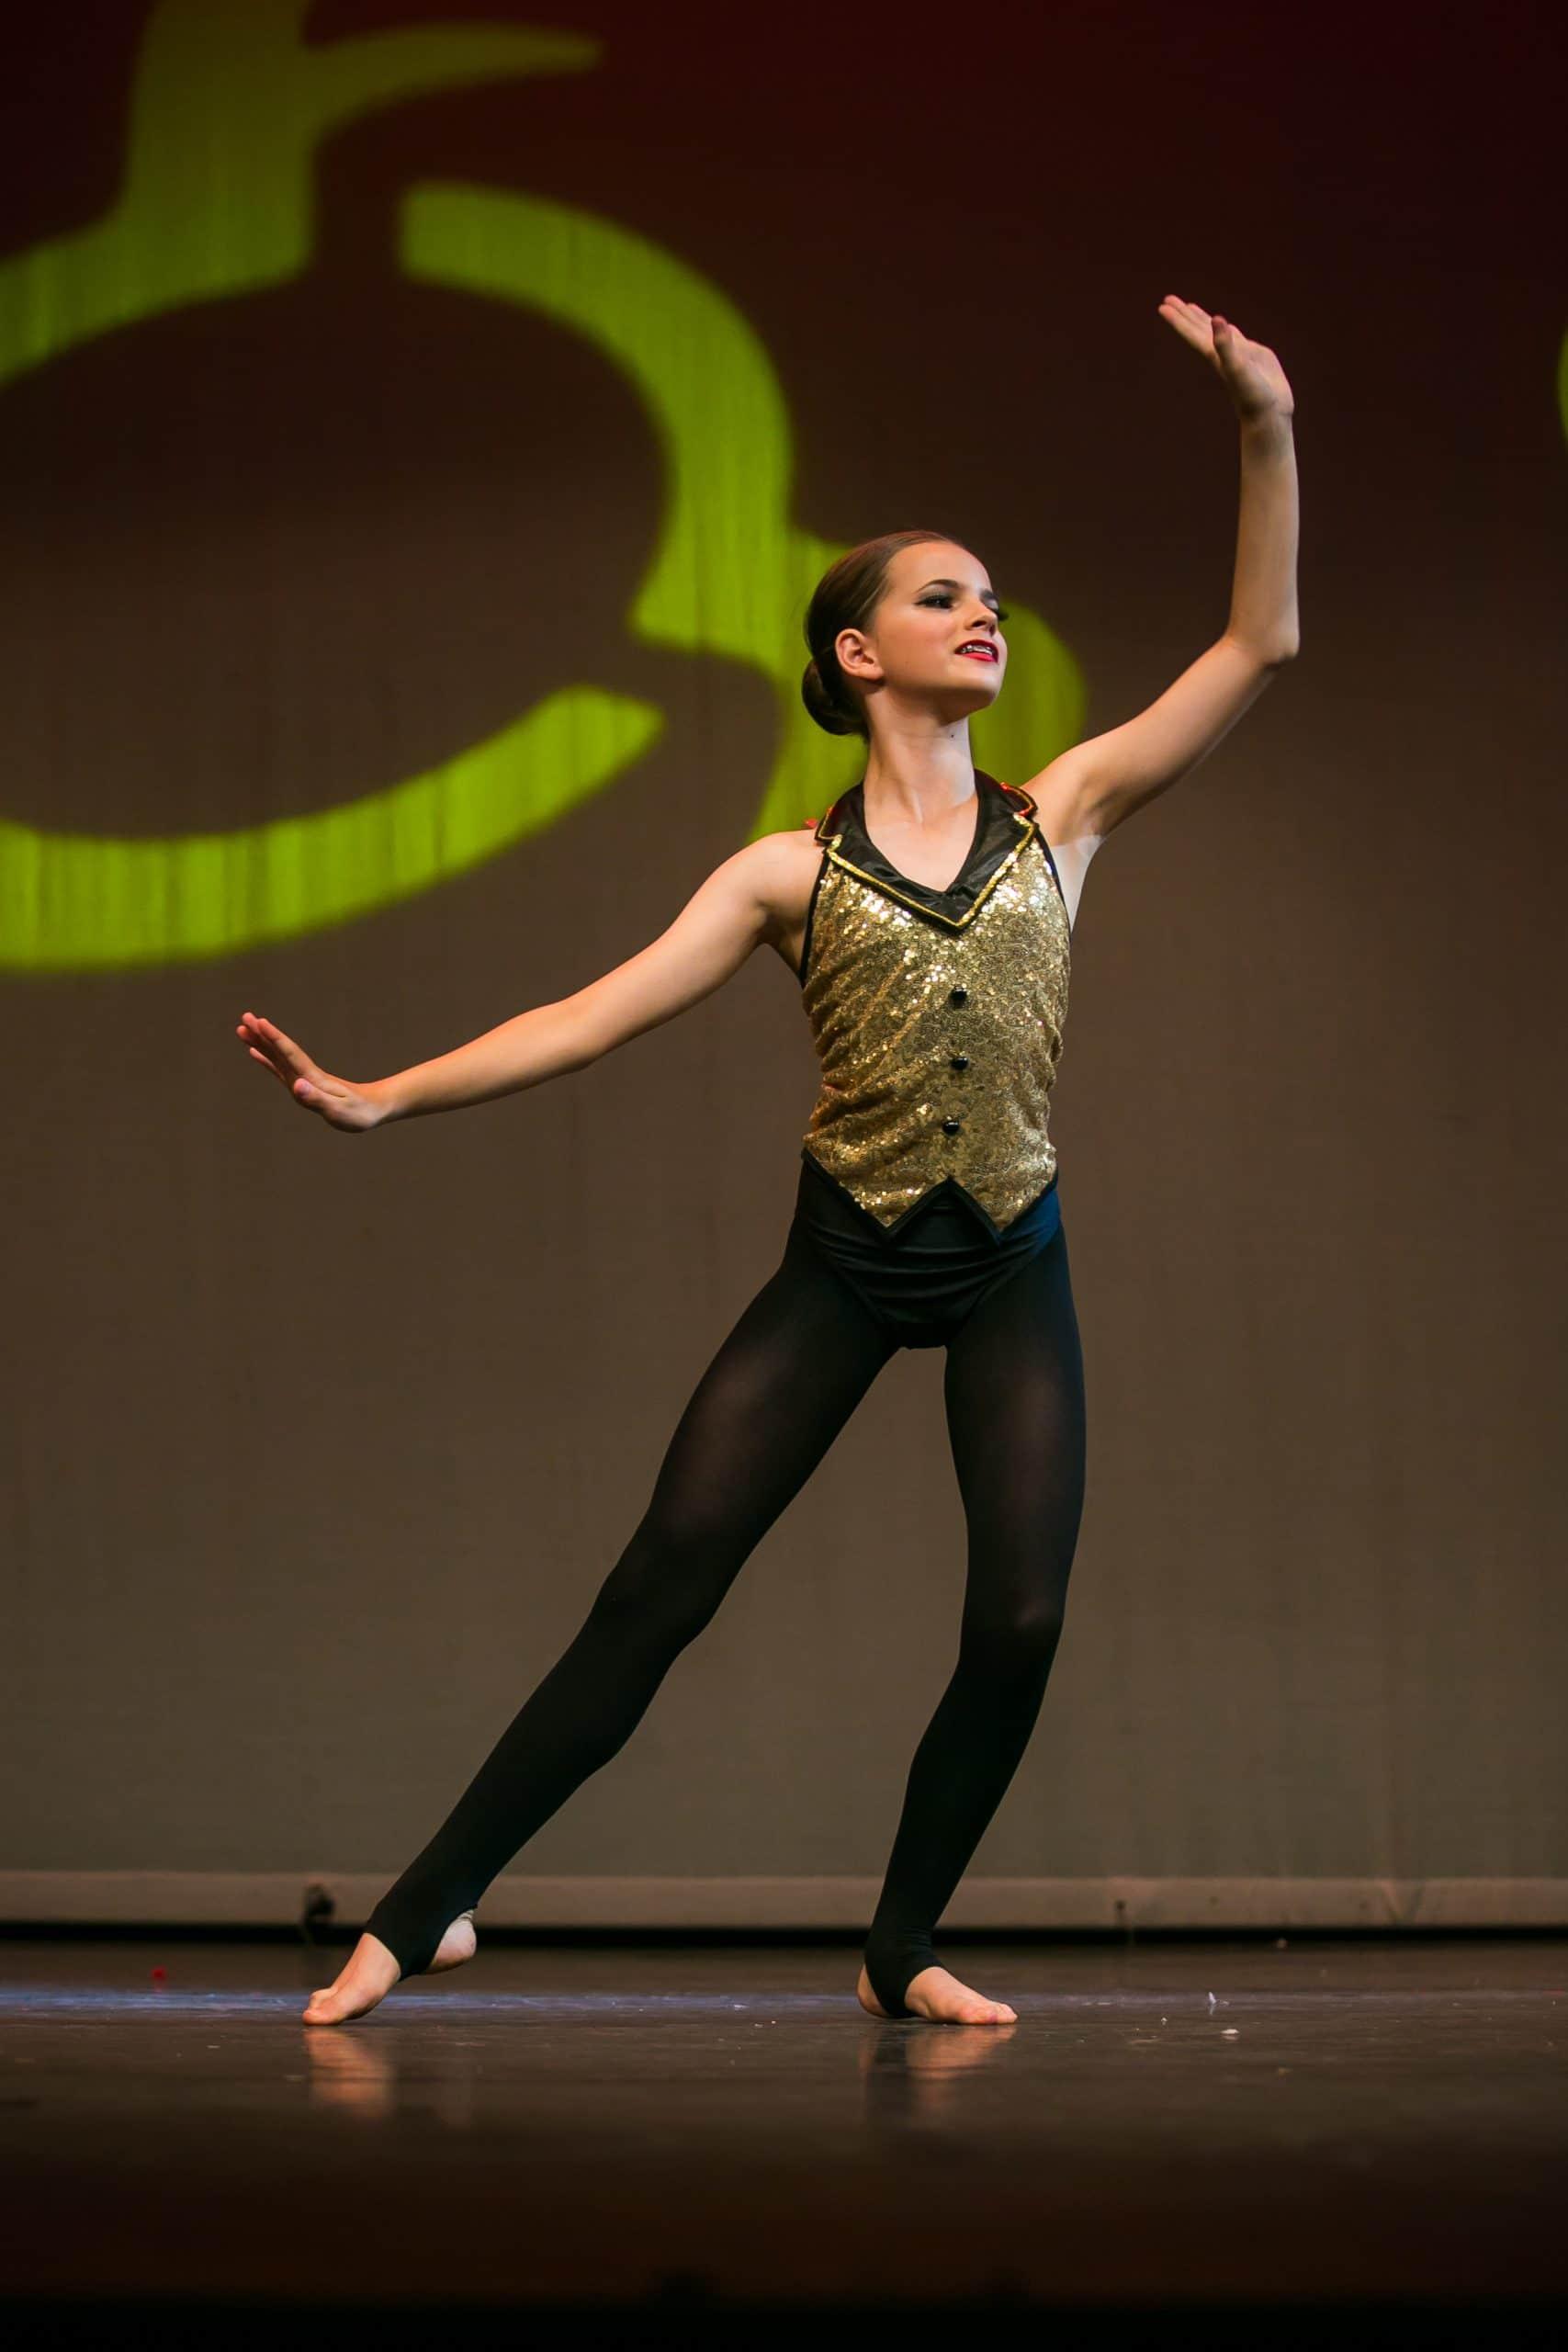 Jazz Dance Classes for Kids in Woking